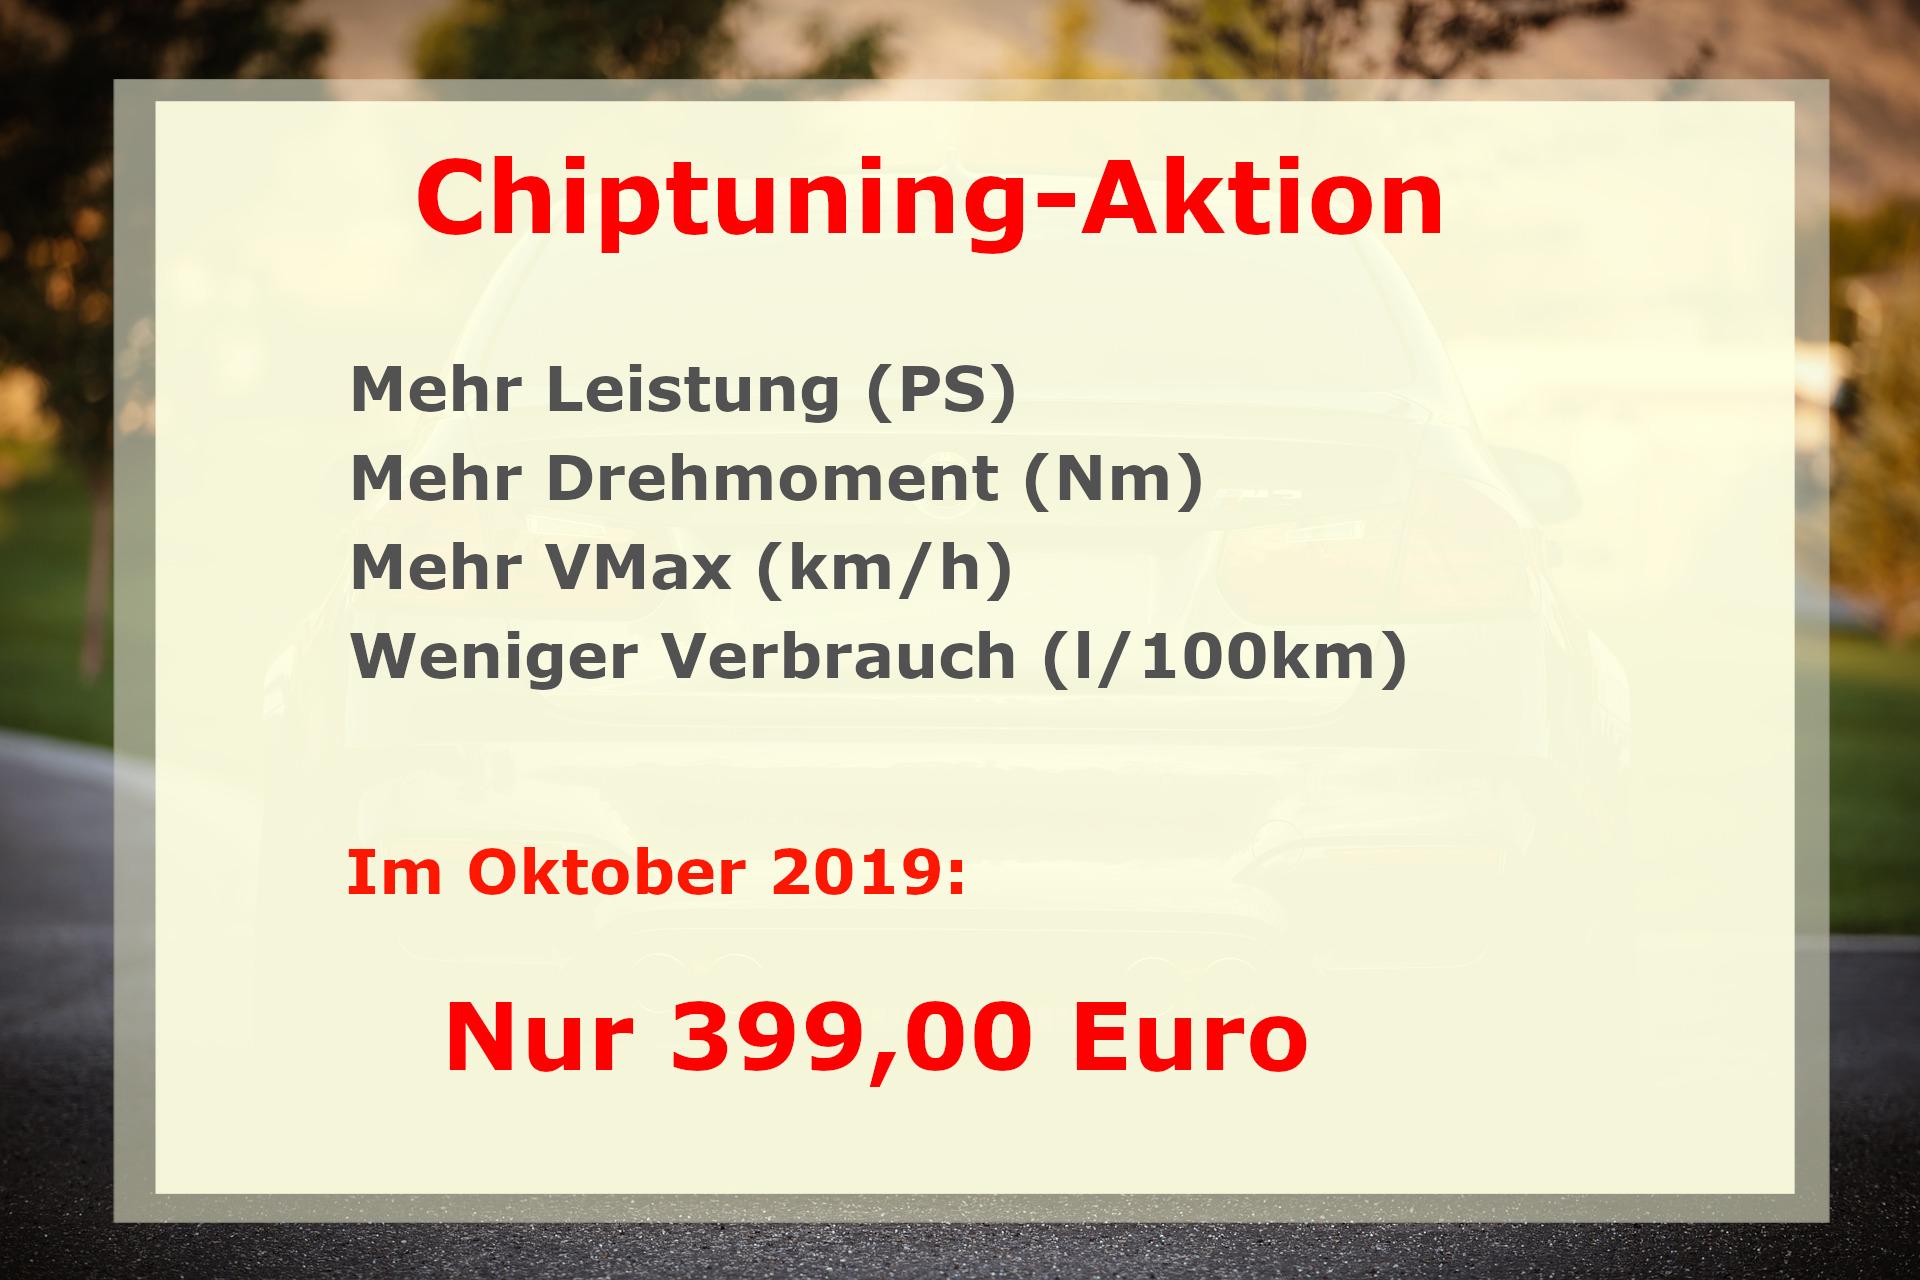 Chiptuning-Aktion im Oktober 2019 in Gummersbach